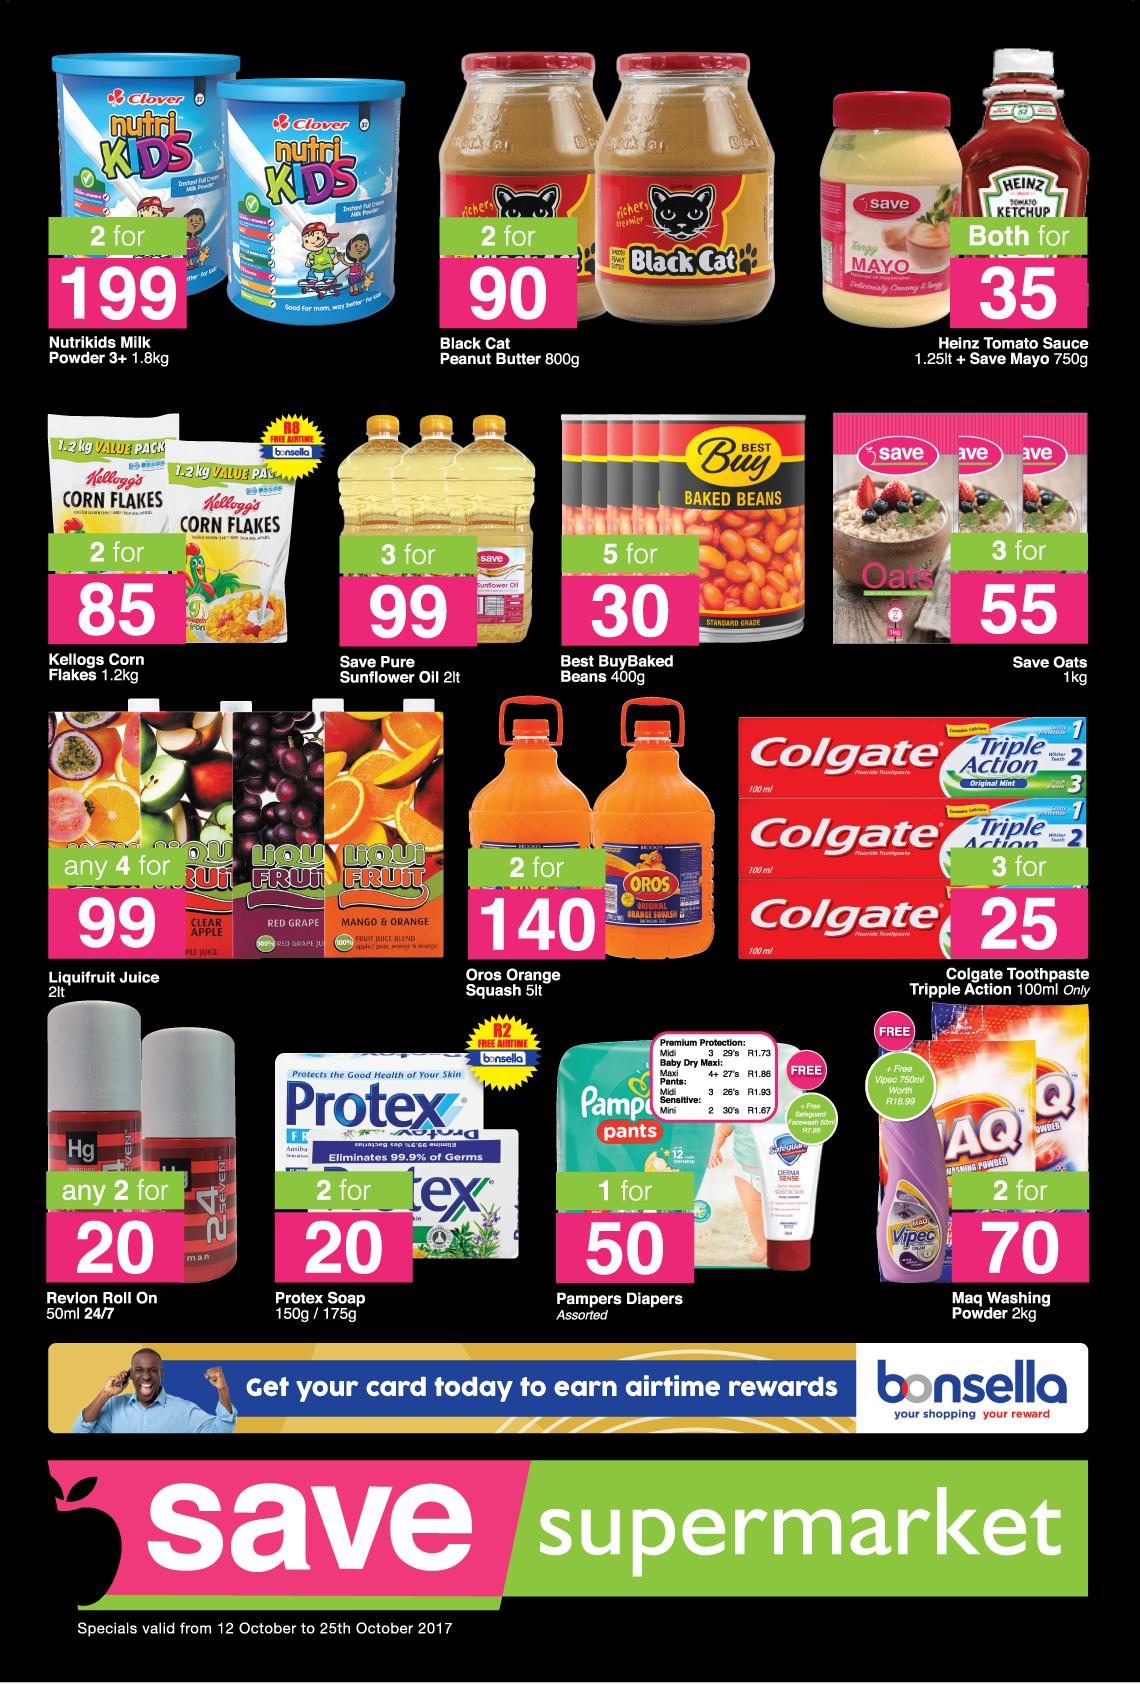 Save Supermarket West Street Specials - until 25th October 2017